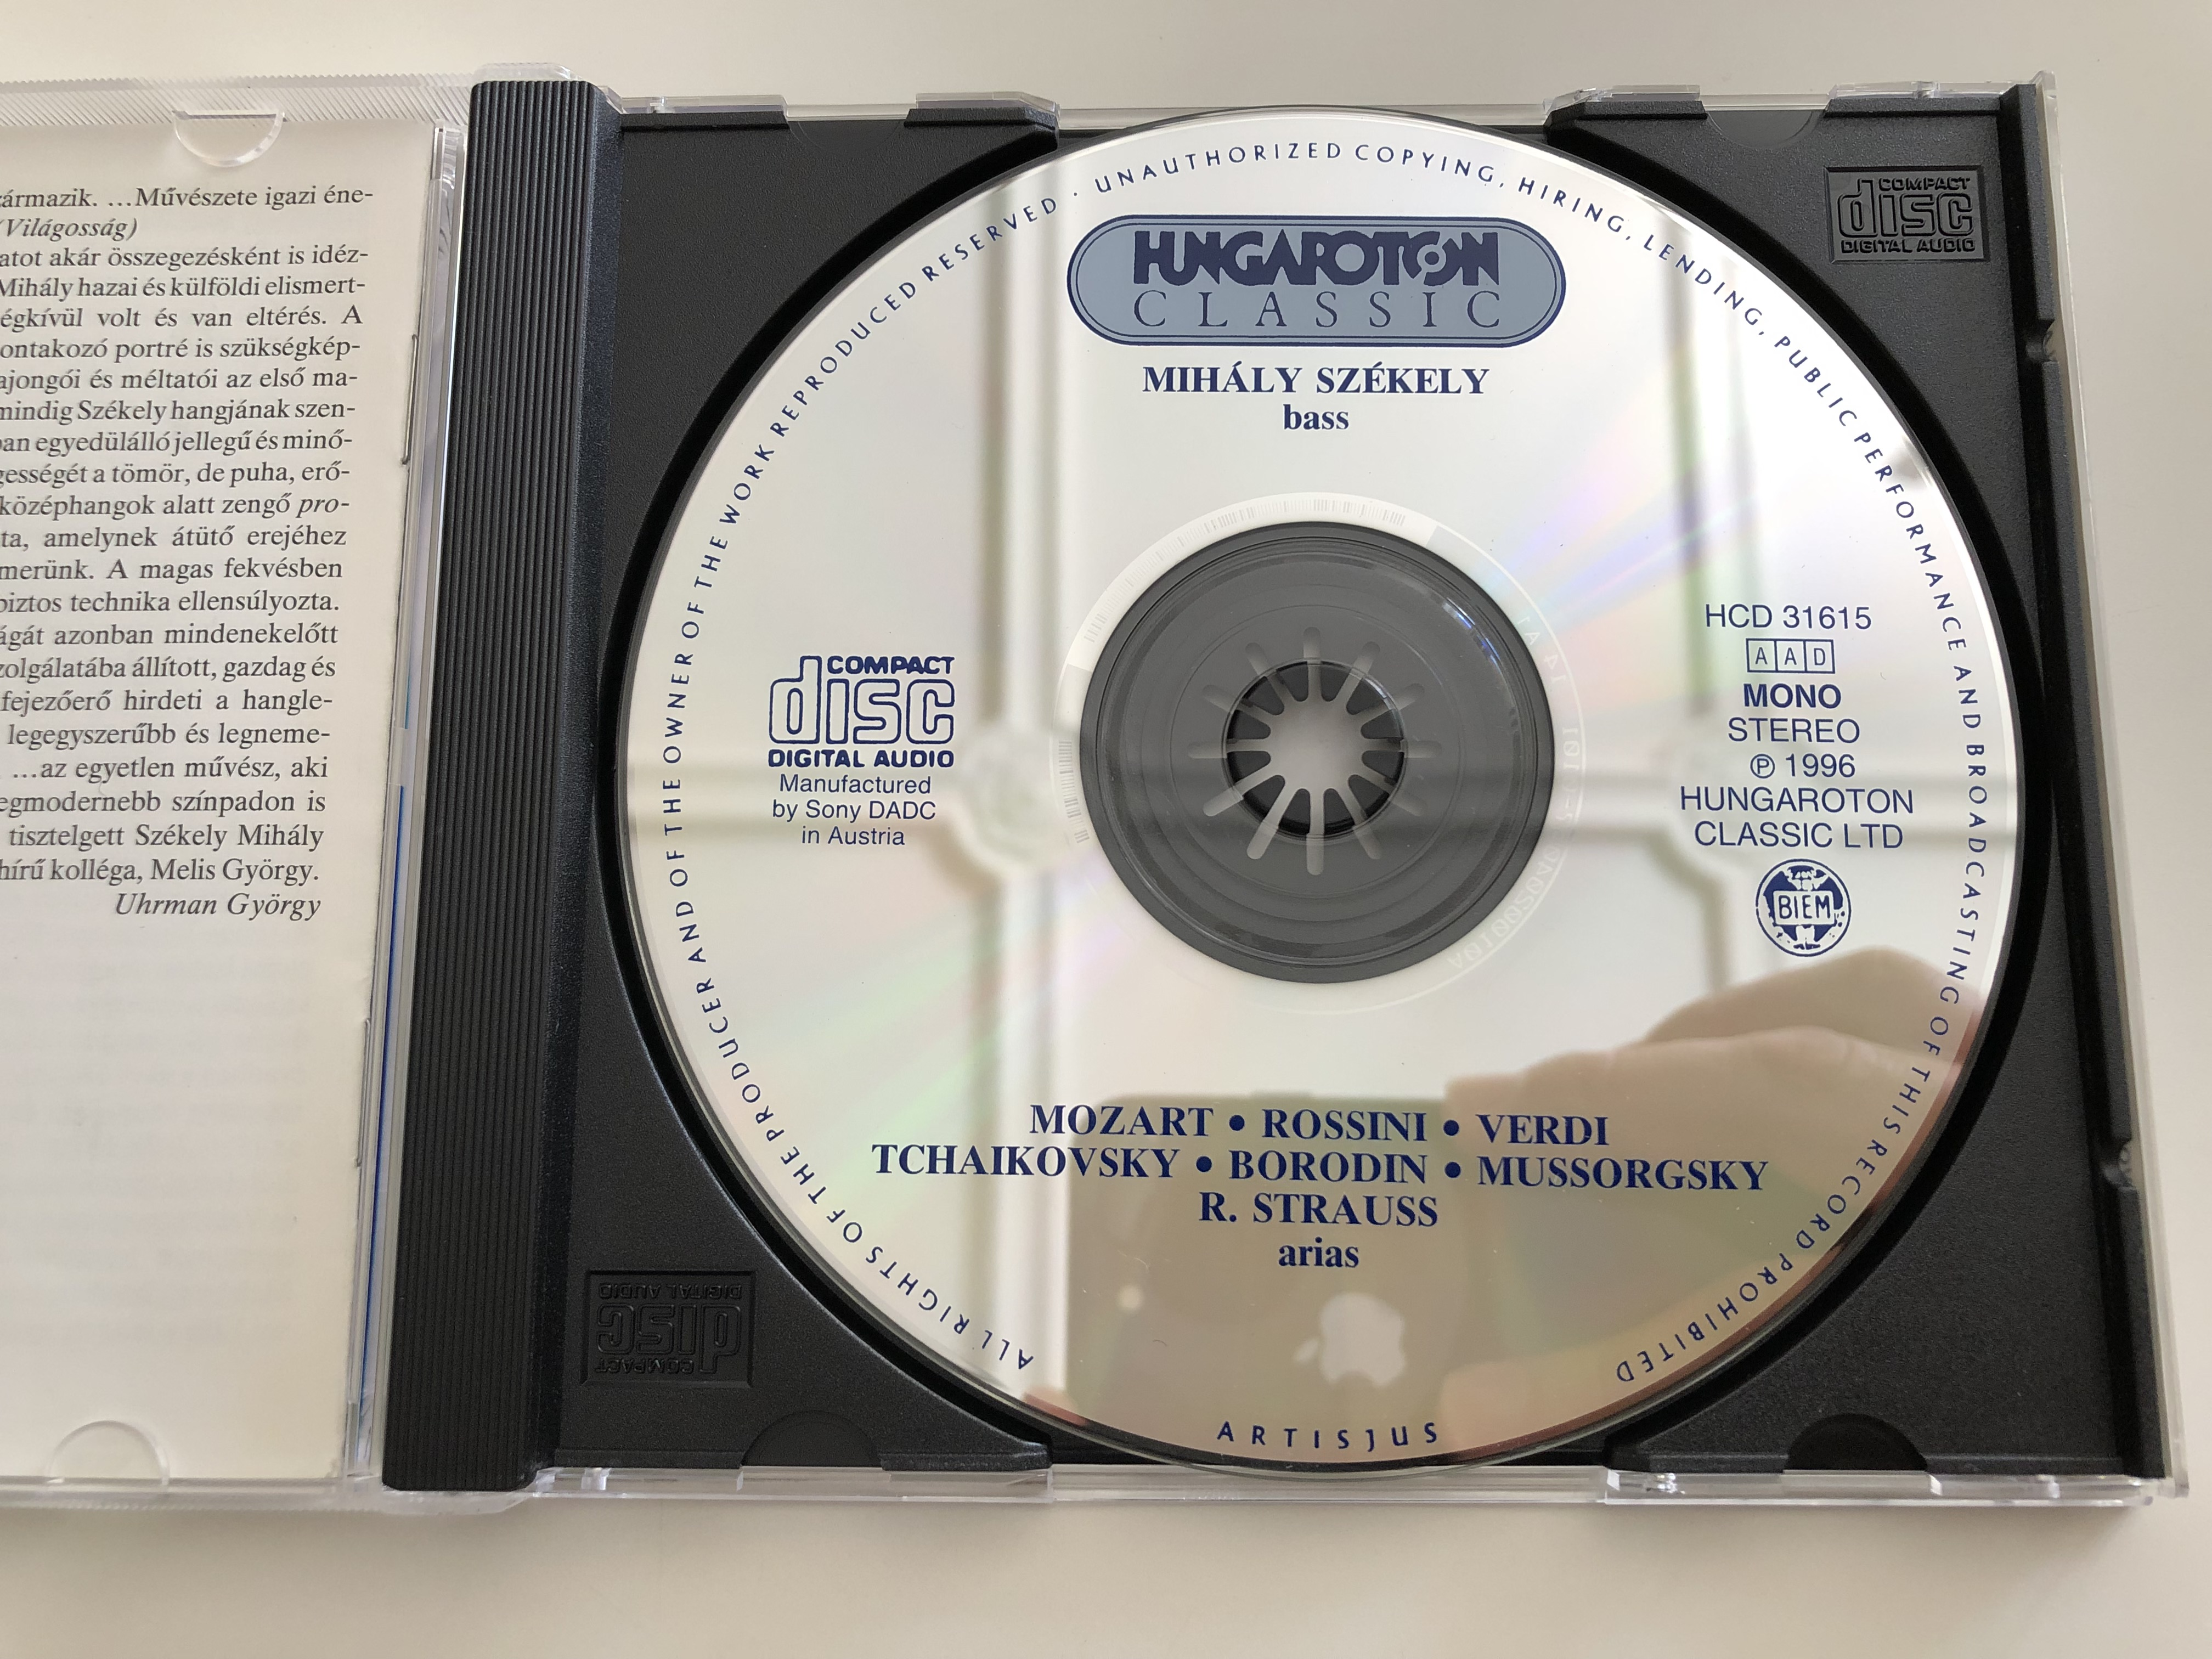 mih-ly-sz-kely-bass-mozart-rossini-verdi-tchaikovsky-borodin-mussorgsky-r.-strauss-great-hungarian-voices-hungaroton-classic-audio-cd-hcd-31615-8-.jpg